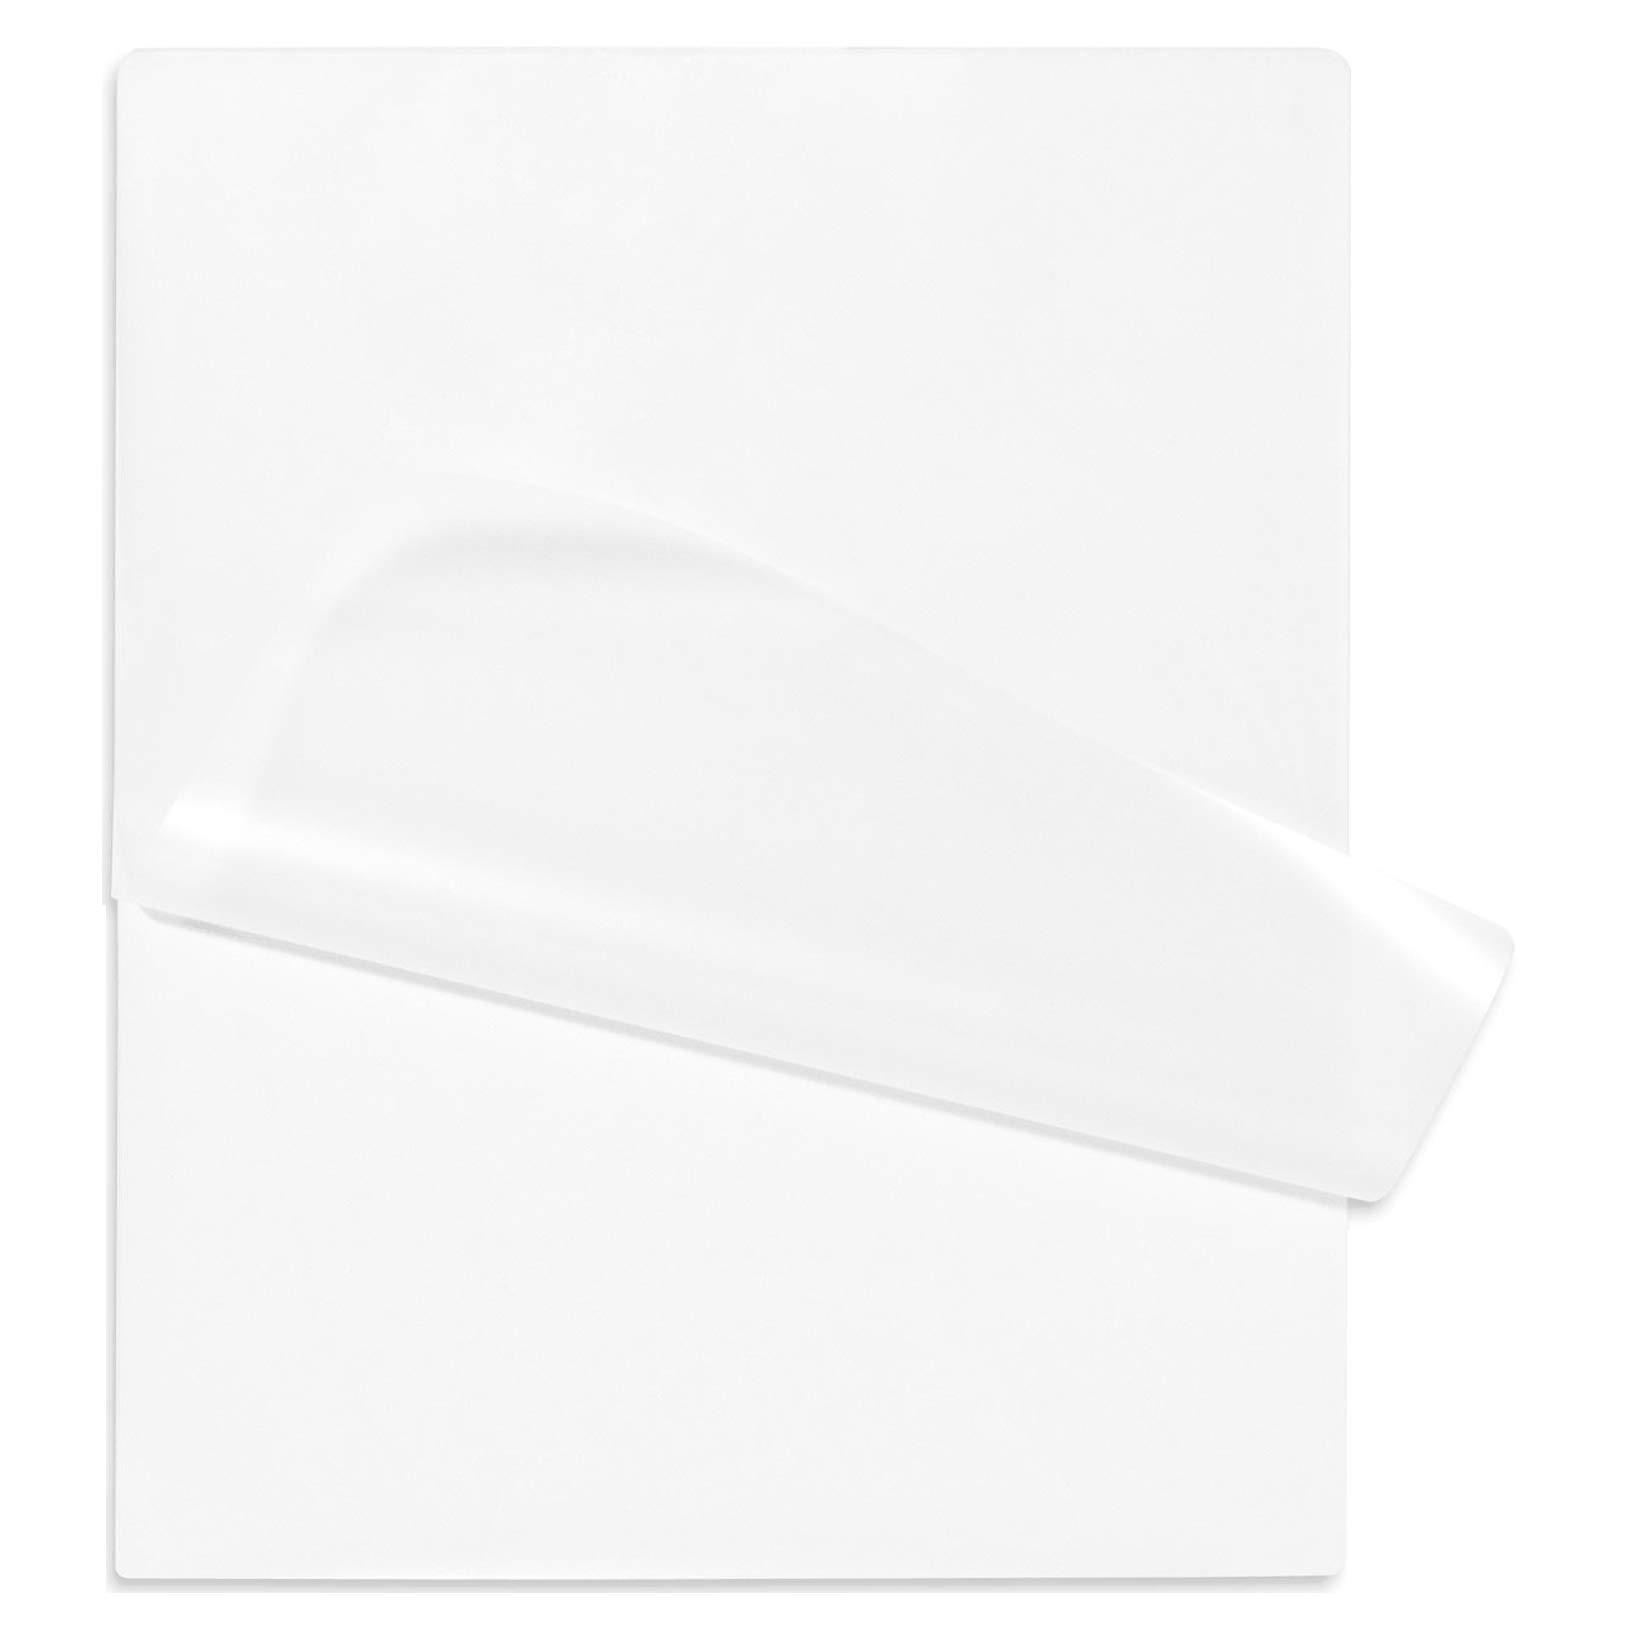 Hot Laminating Pouches 3 Mil (Pk of 100) 11-1/4 x 17-1/4 Laminator Sleeves Mini Menu Size Clear Glossy by Oregon Lamination Premium